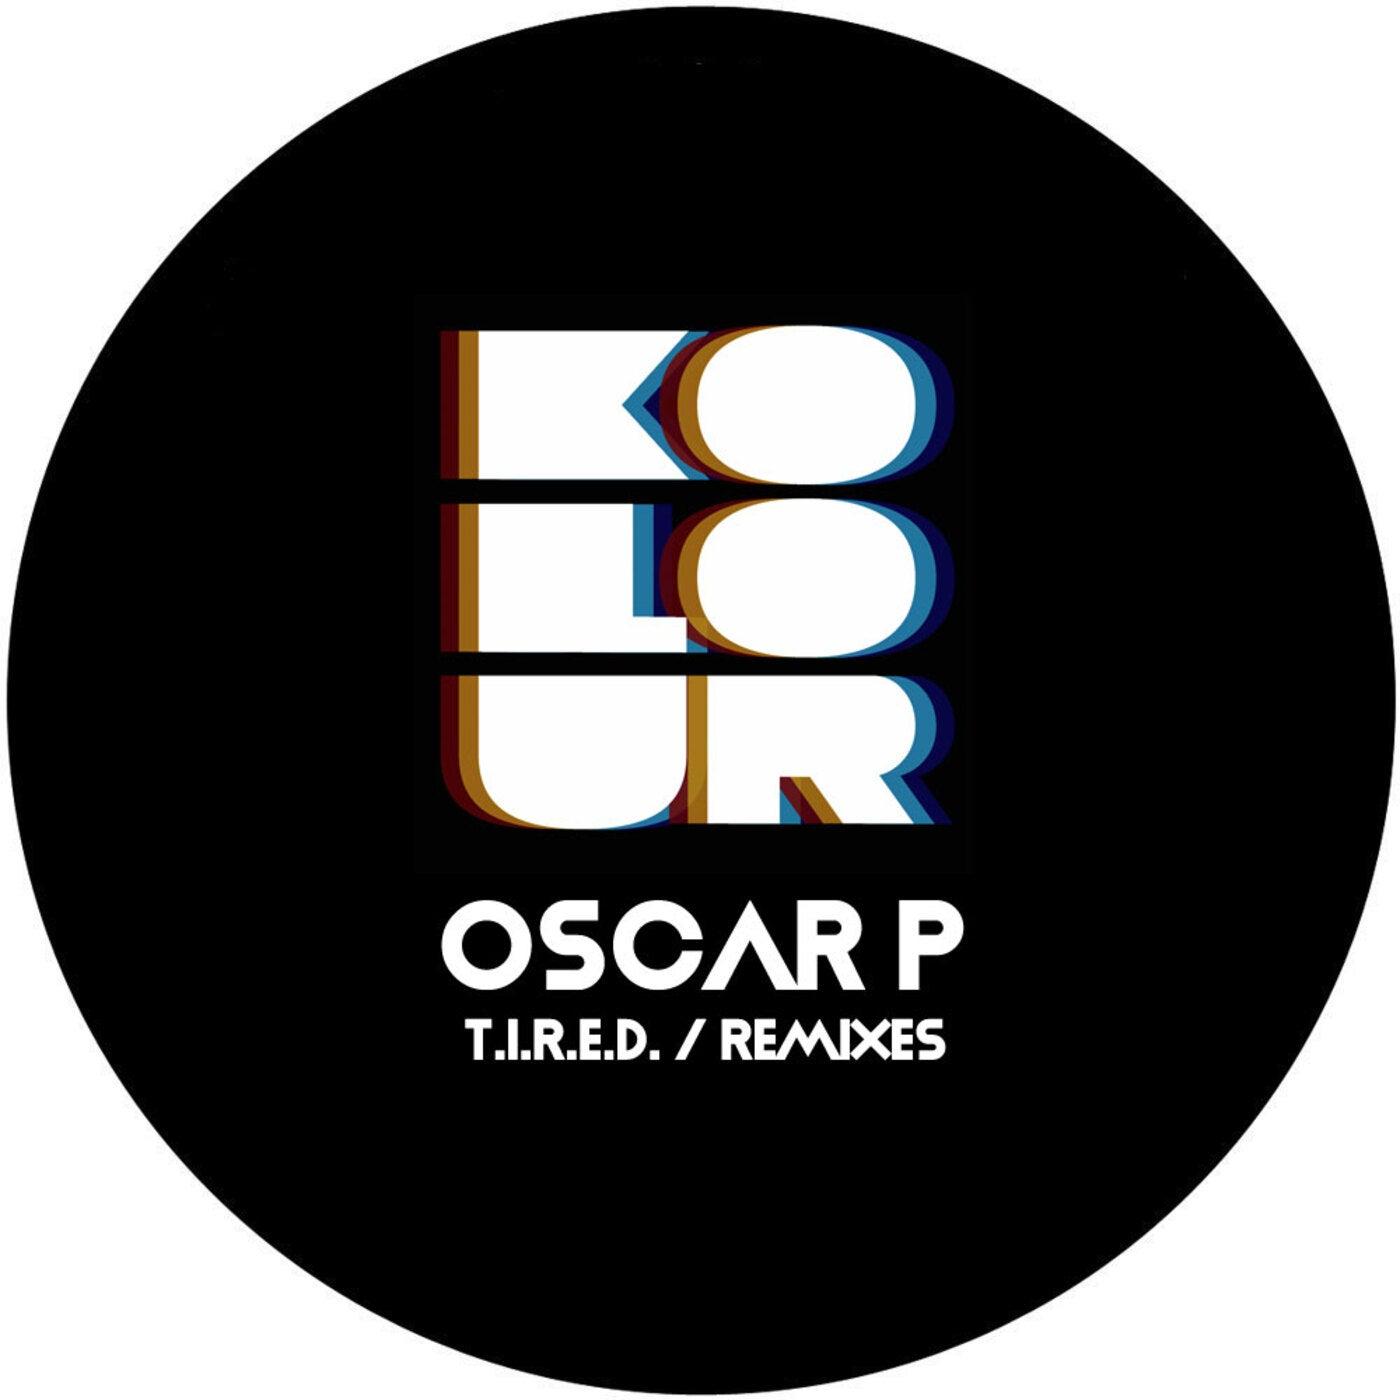 T.I.R.E.D. (Norty Cotto Remix)